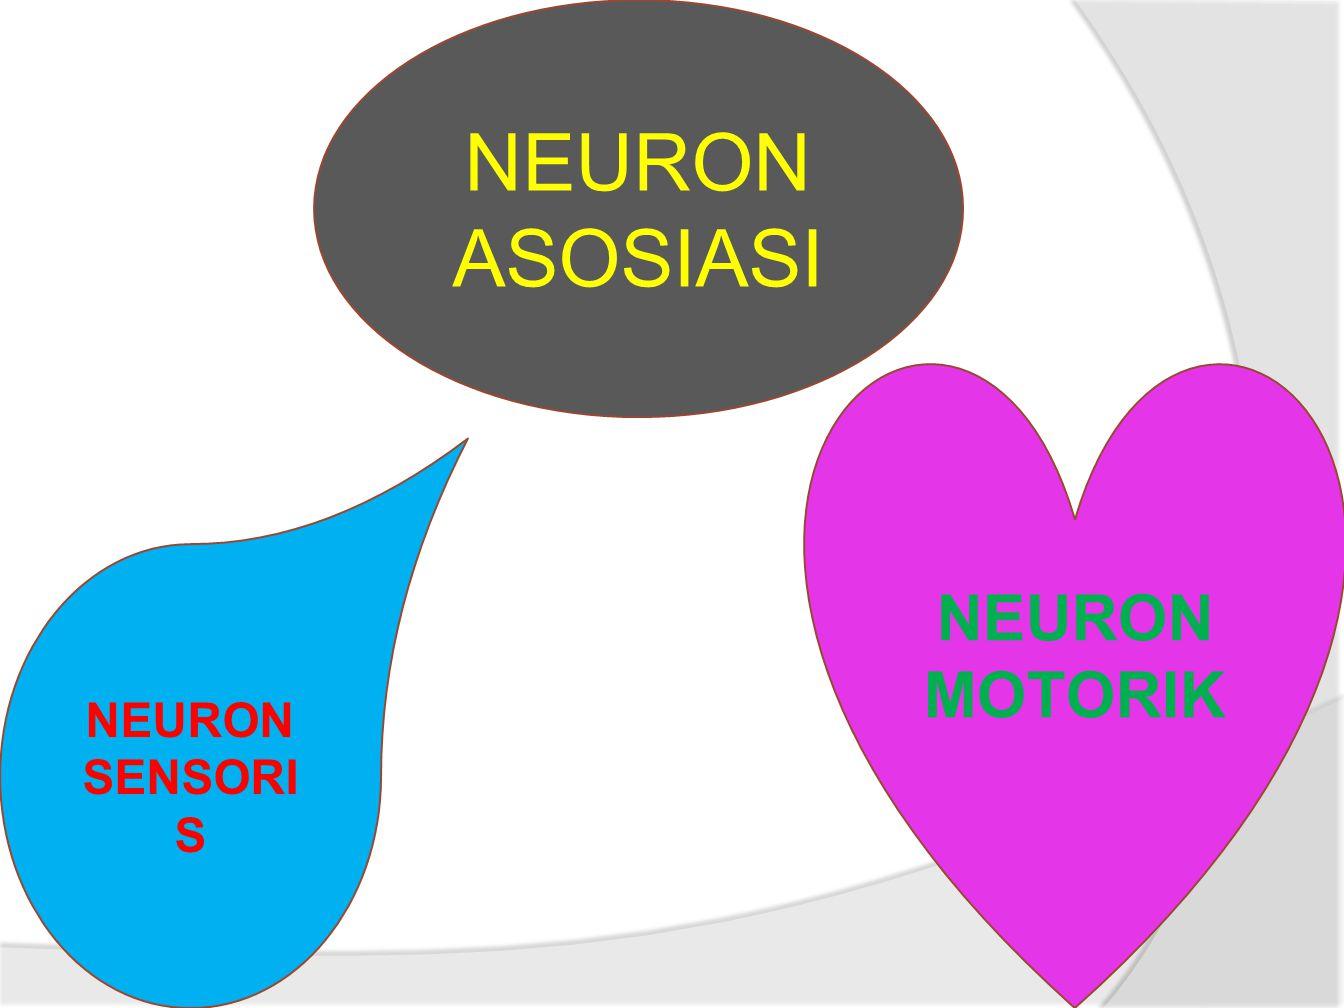 NEURON ASOSIASI NEURON SENSORI S NEURON MOTORIK